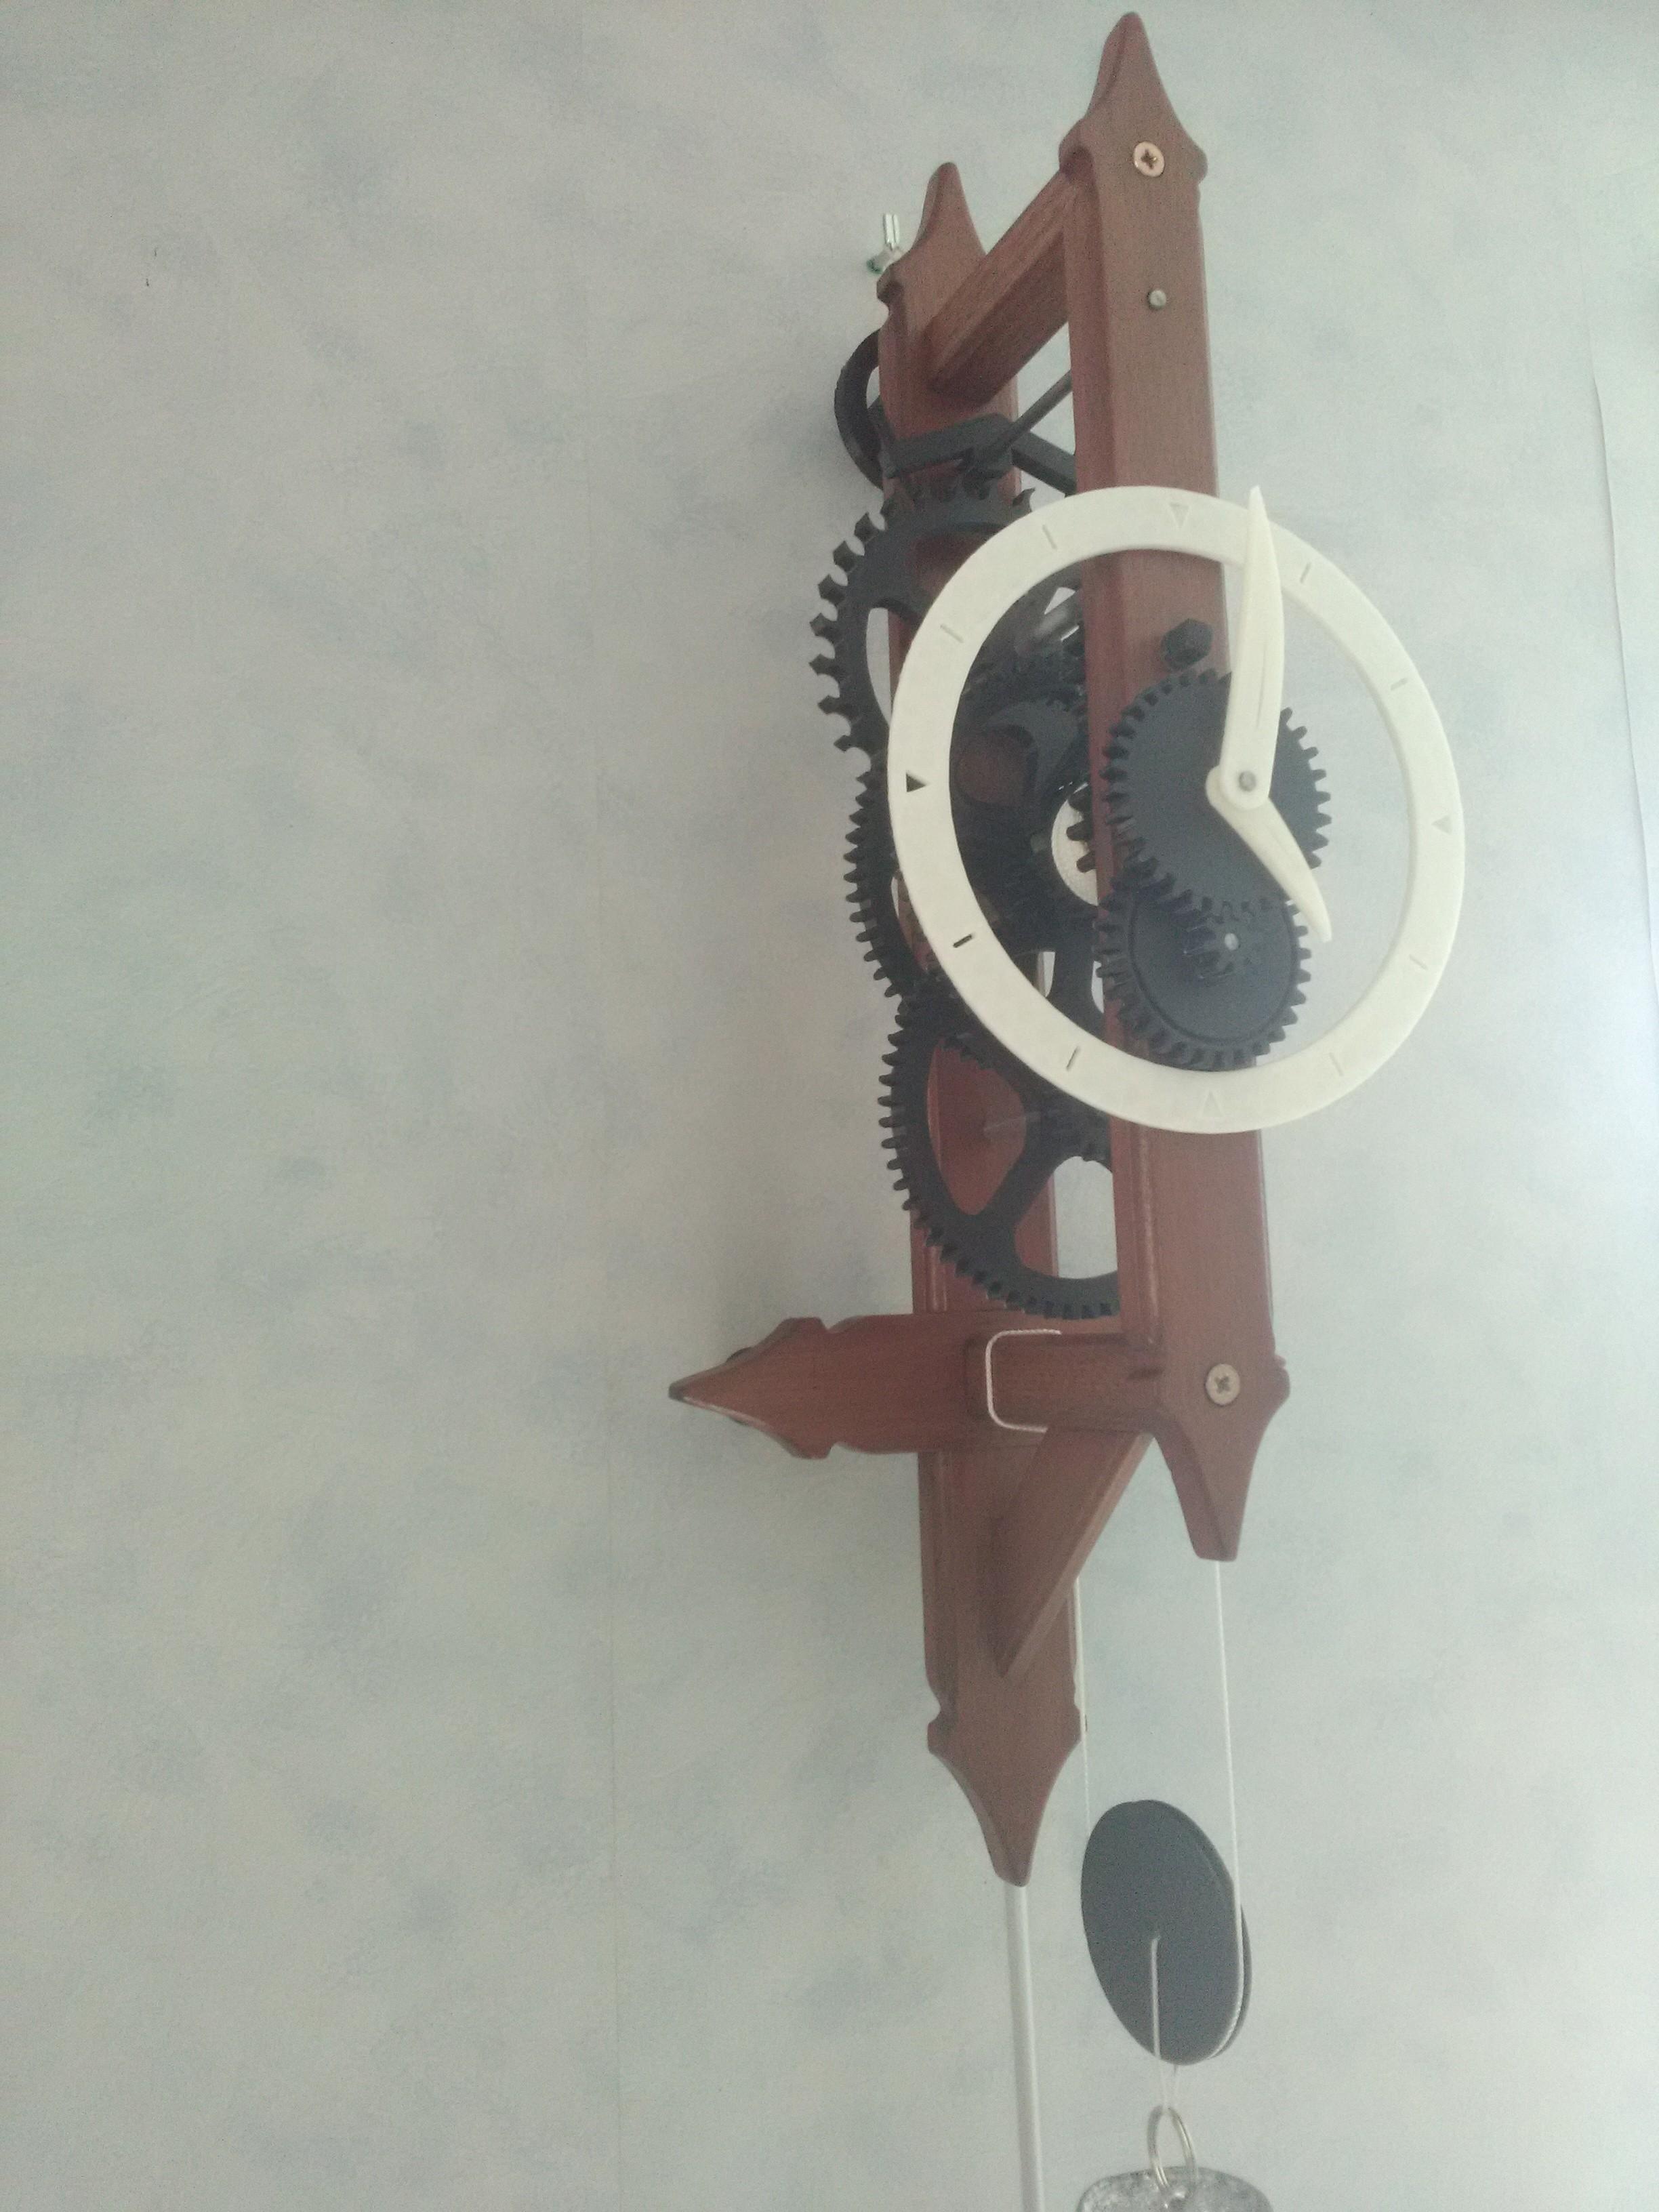 Horloge 3.jpg Download free STL file Mechanical clock to go up • Object to 3D print, CedricRoy